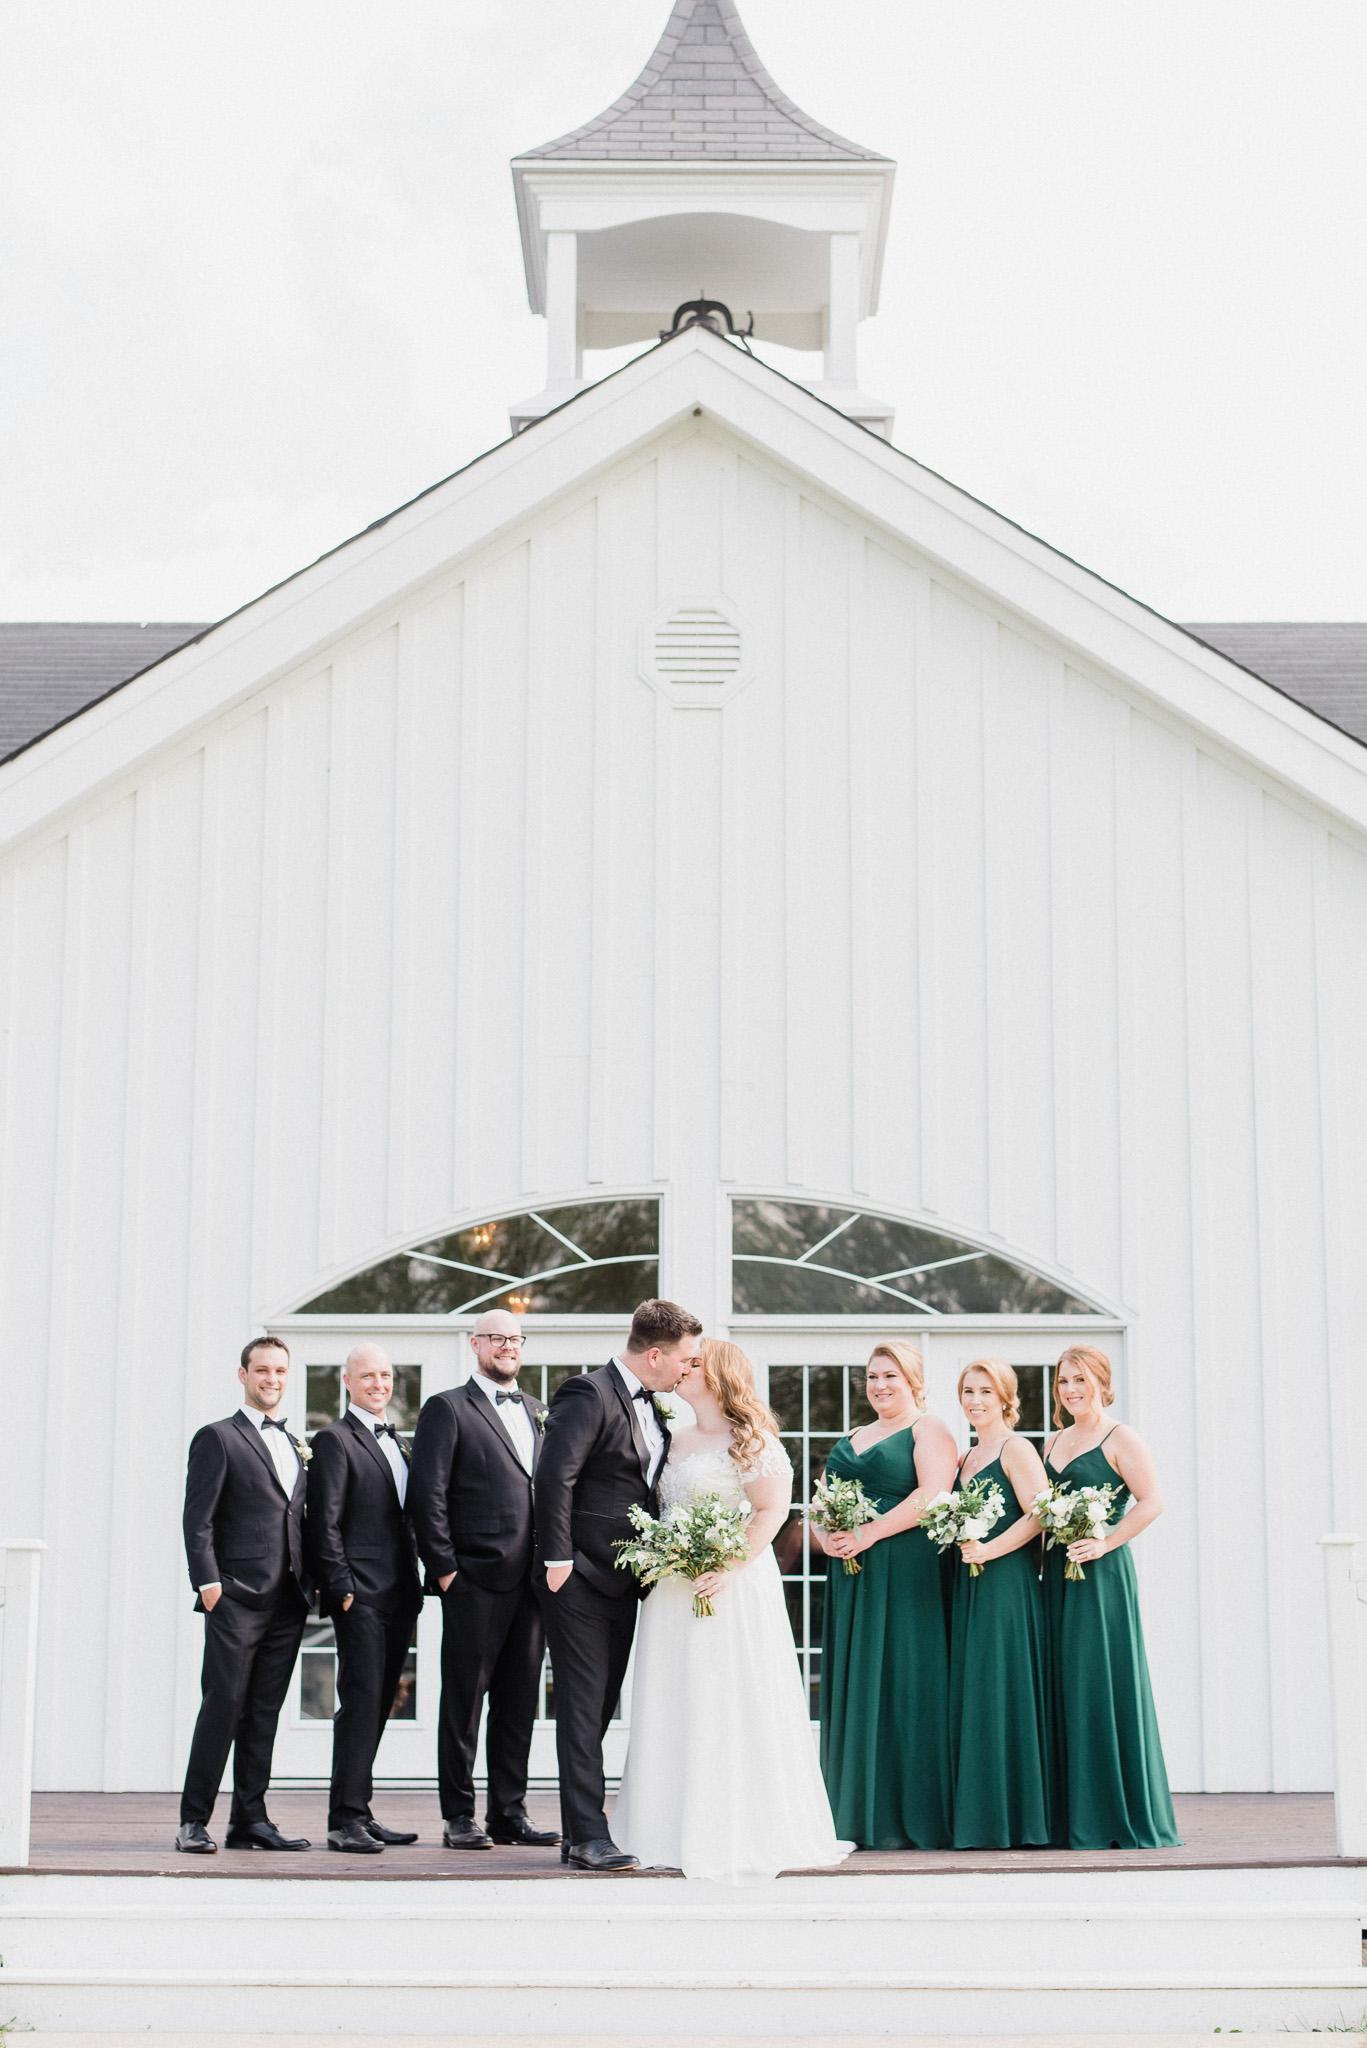 Gold & Green themed wedding by Jenn Kavanagh Photography